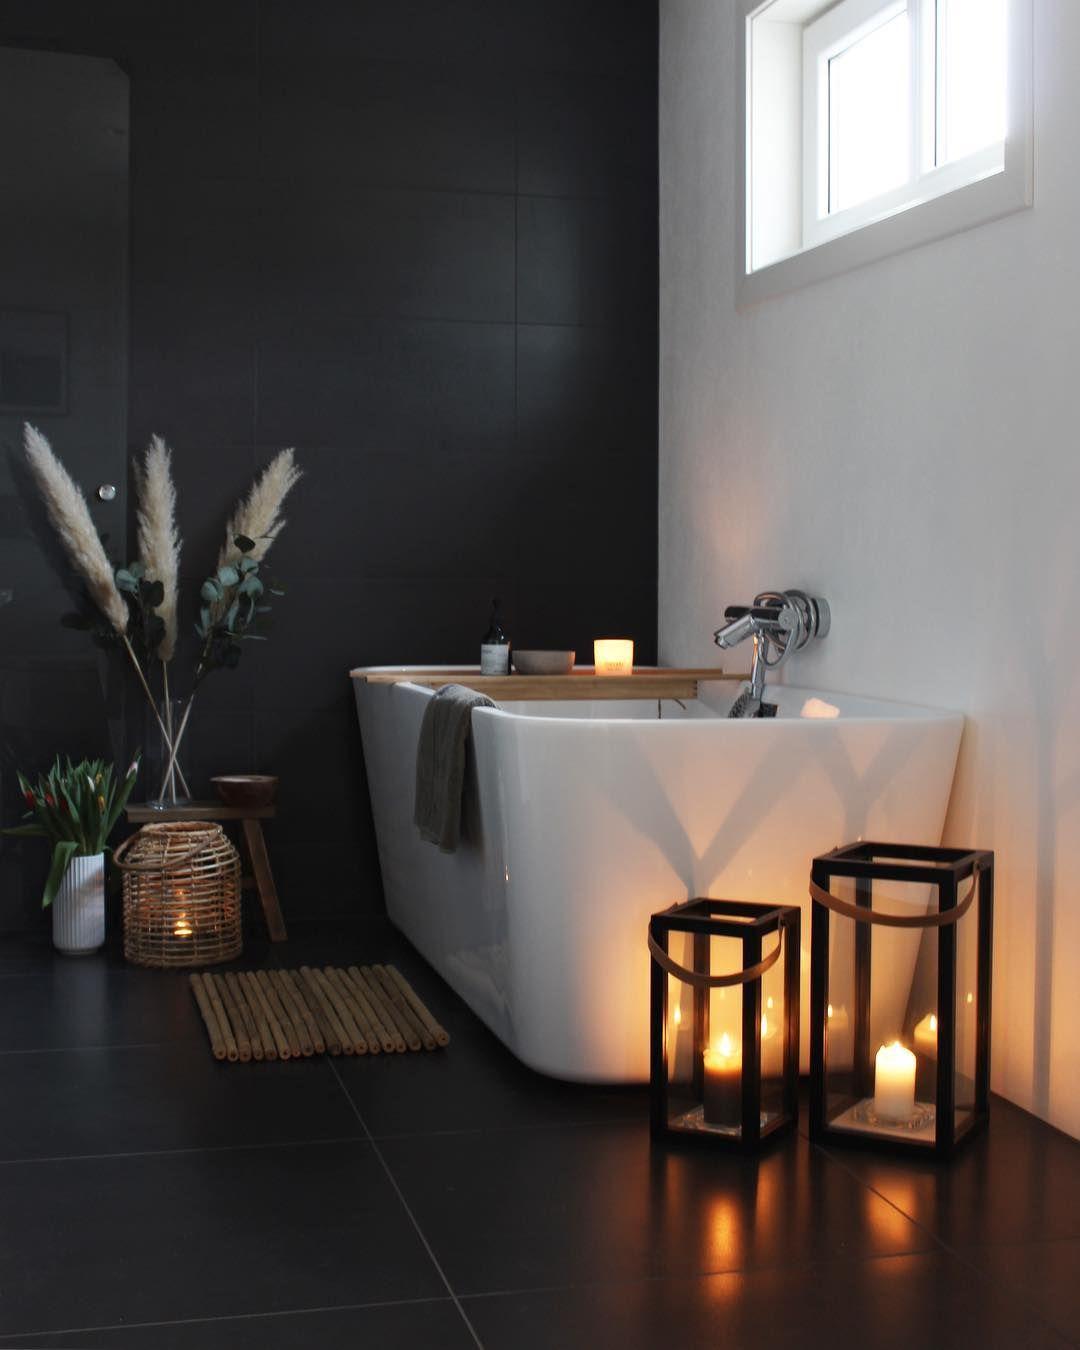 New The 10 Best Home Decor With Pictures Starter Sondagen Rolig I Maritstua Jeg Og Gutt Bathroom Inspiration Bathroom Interior Design Bathrooms Remodel